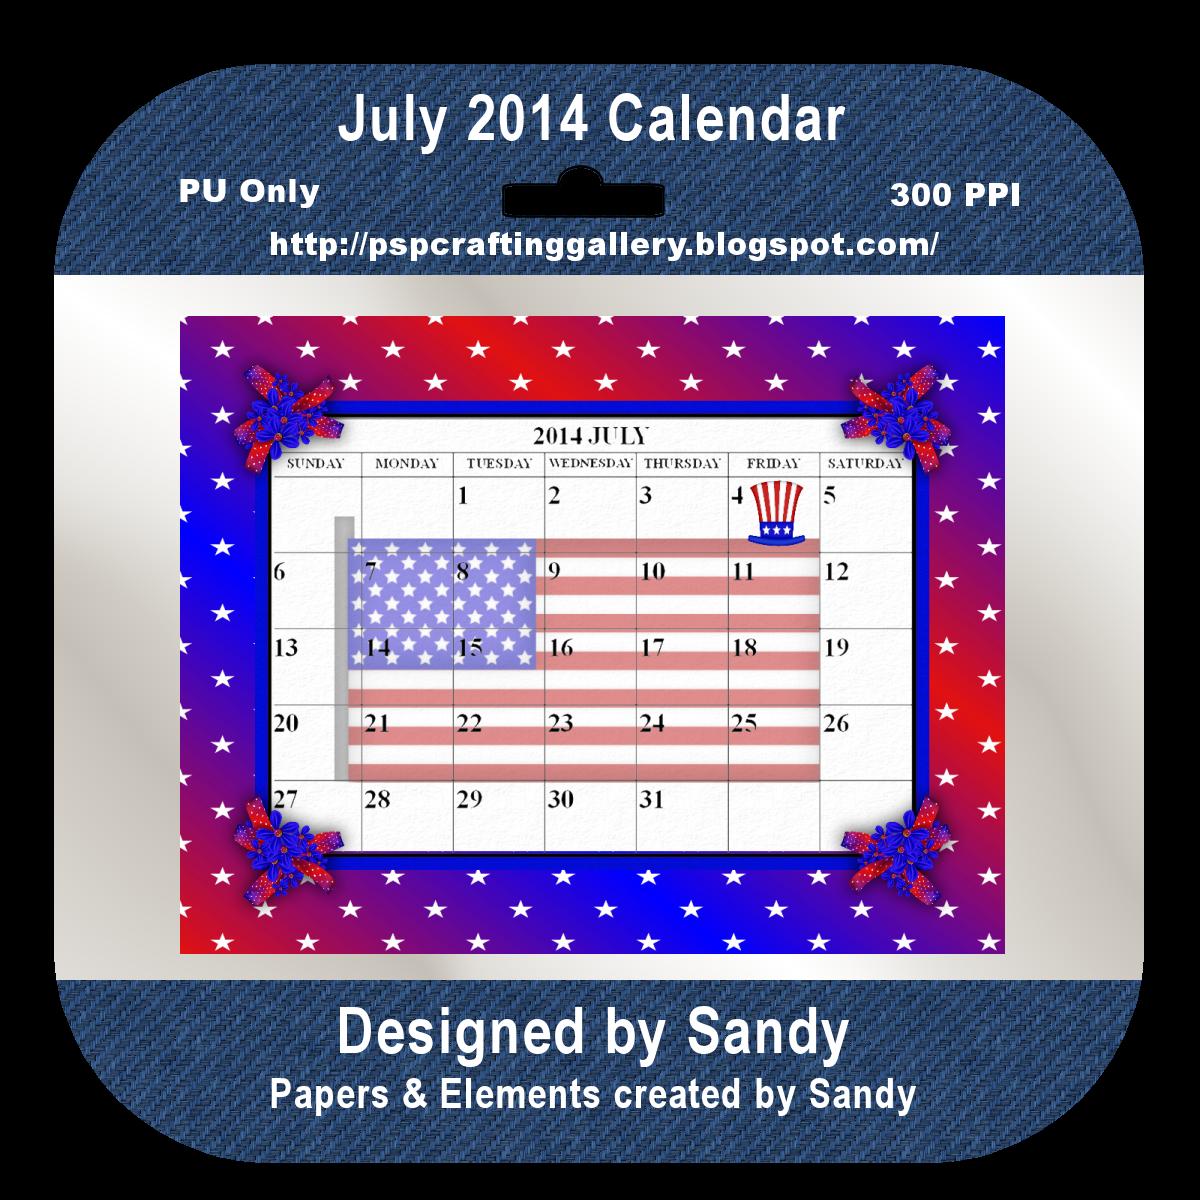 http://4.bp.blogspot.com/-sRJDxJtIAck/U5SmtIT7uXI/AAAAAAAAIMY/6zPBWWKWeaQ/s1600/July+2014+Calendar+by+Sandy.png